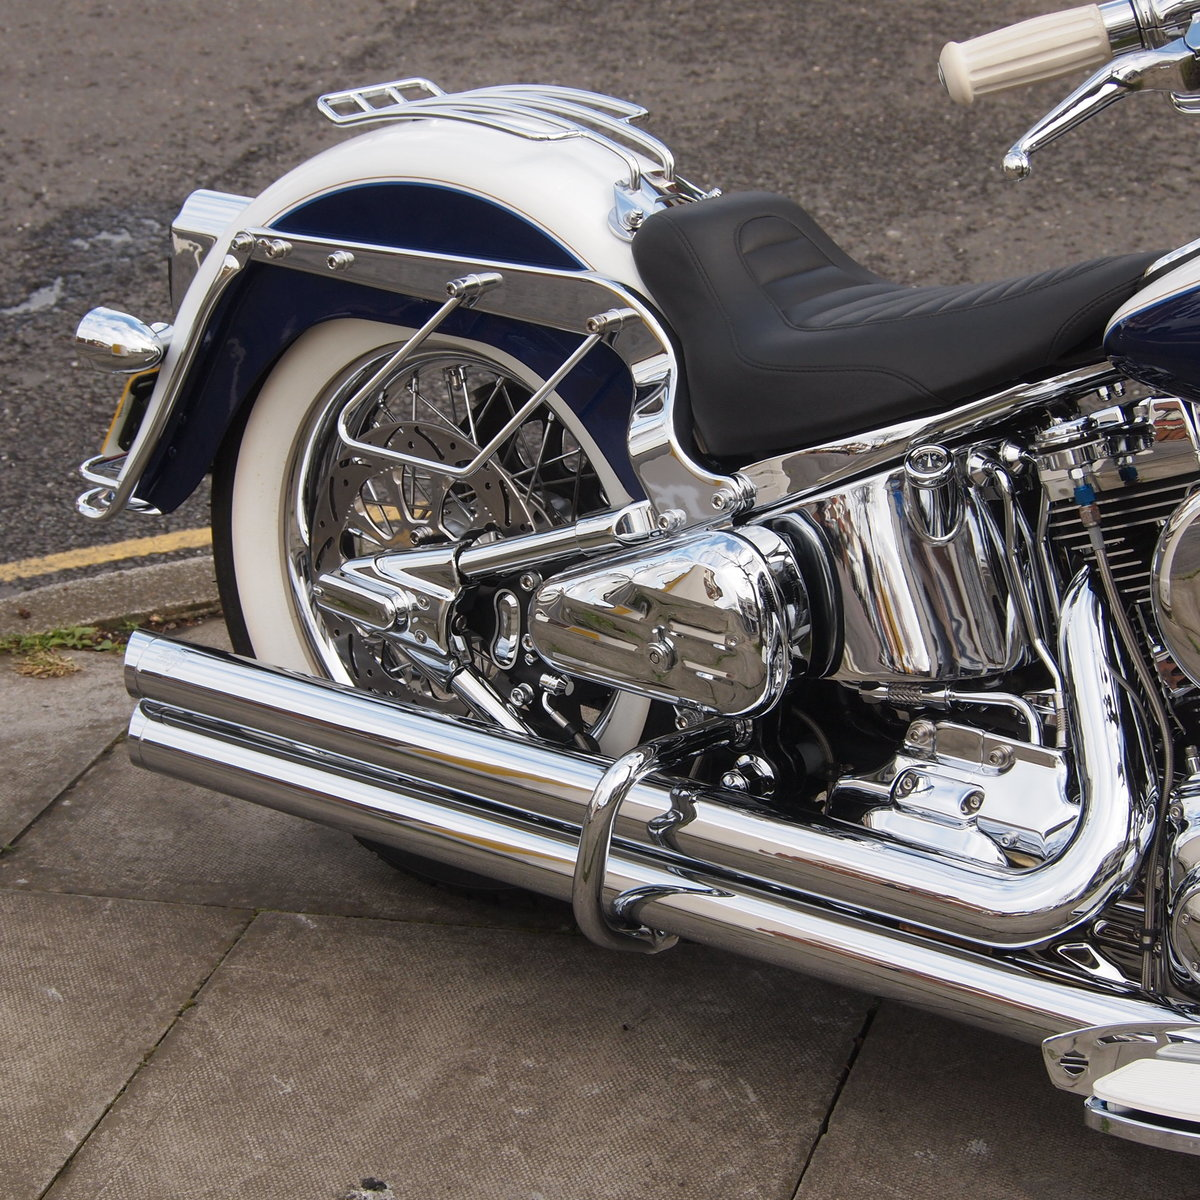 2008 Harley Davidson FLSTN Deluxe, RESERVED FOR FLEMMING. SOLD (picture 5 of 6)